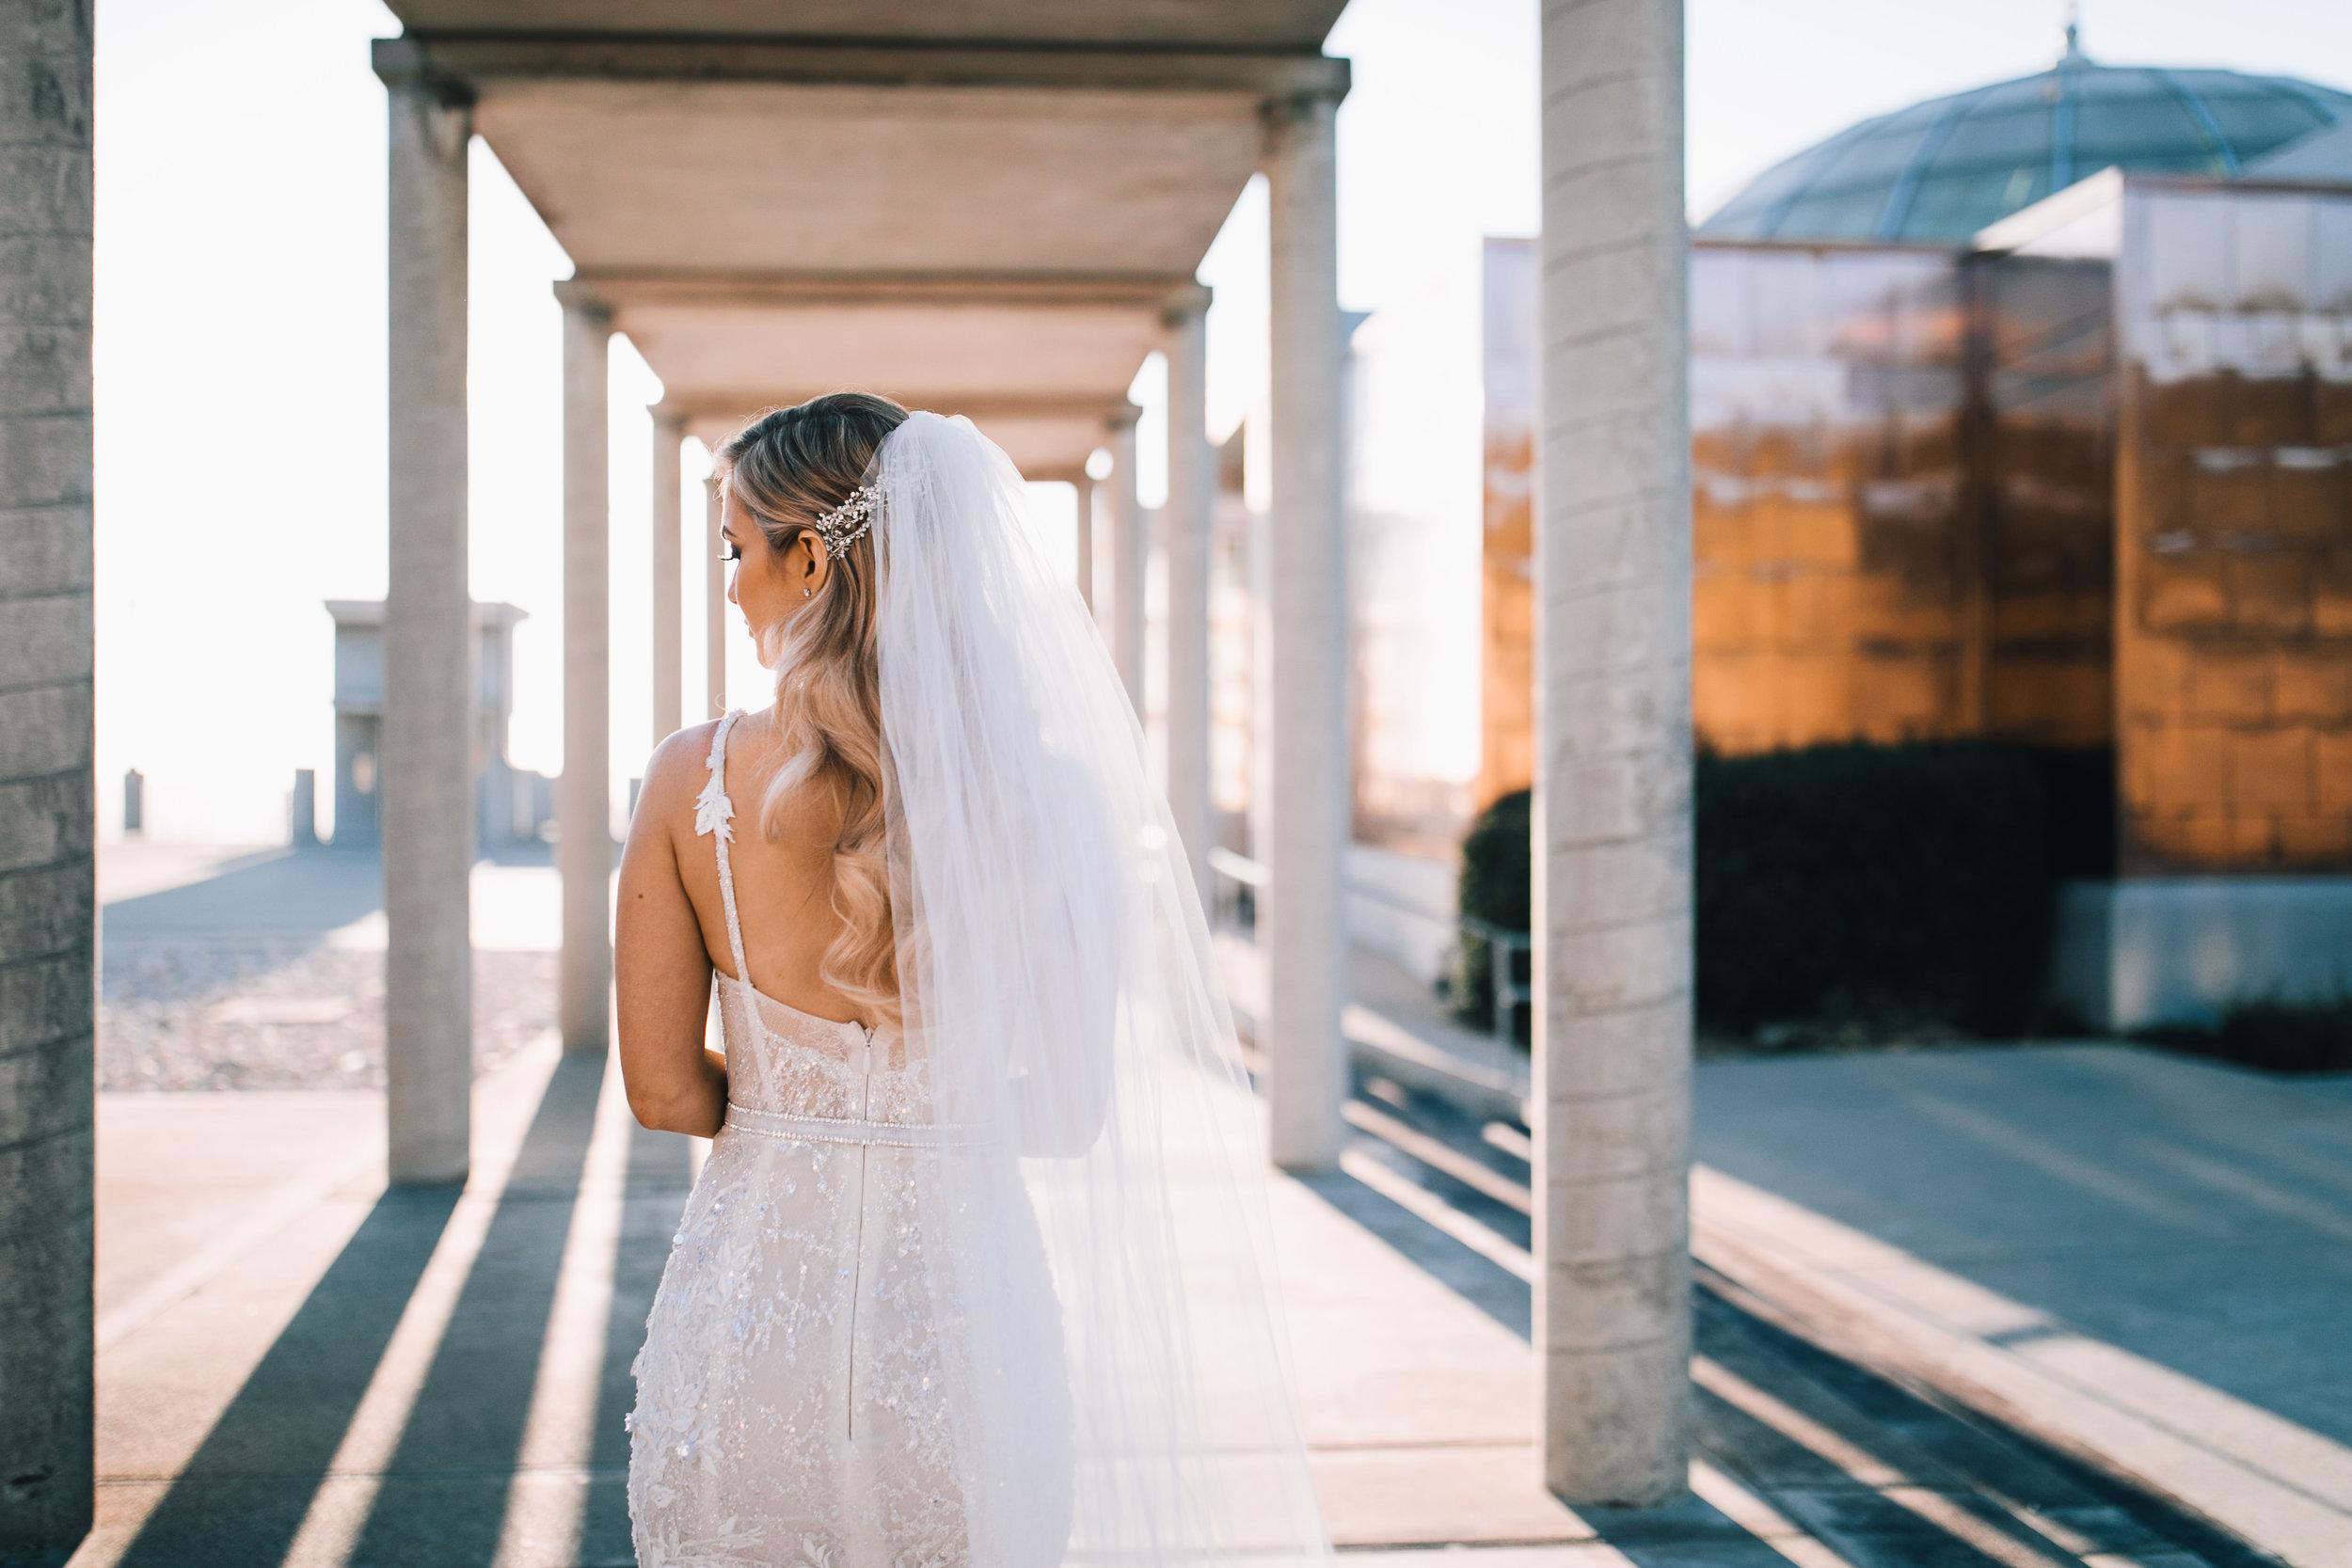 2018.09.08 Litsa and Sofo Greek Wedding Sneak Peak-13.jpg